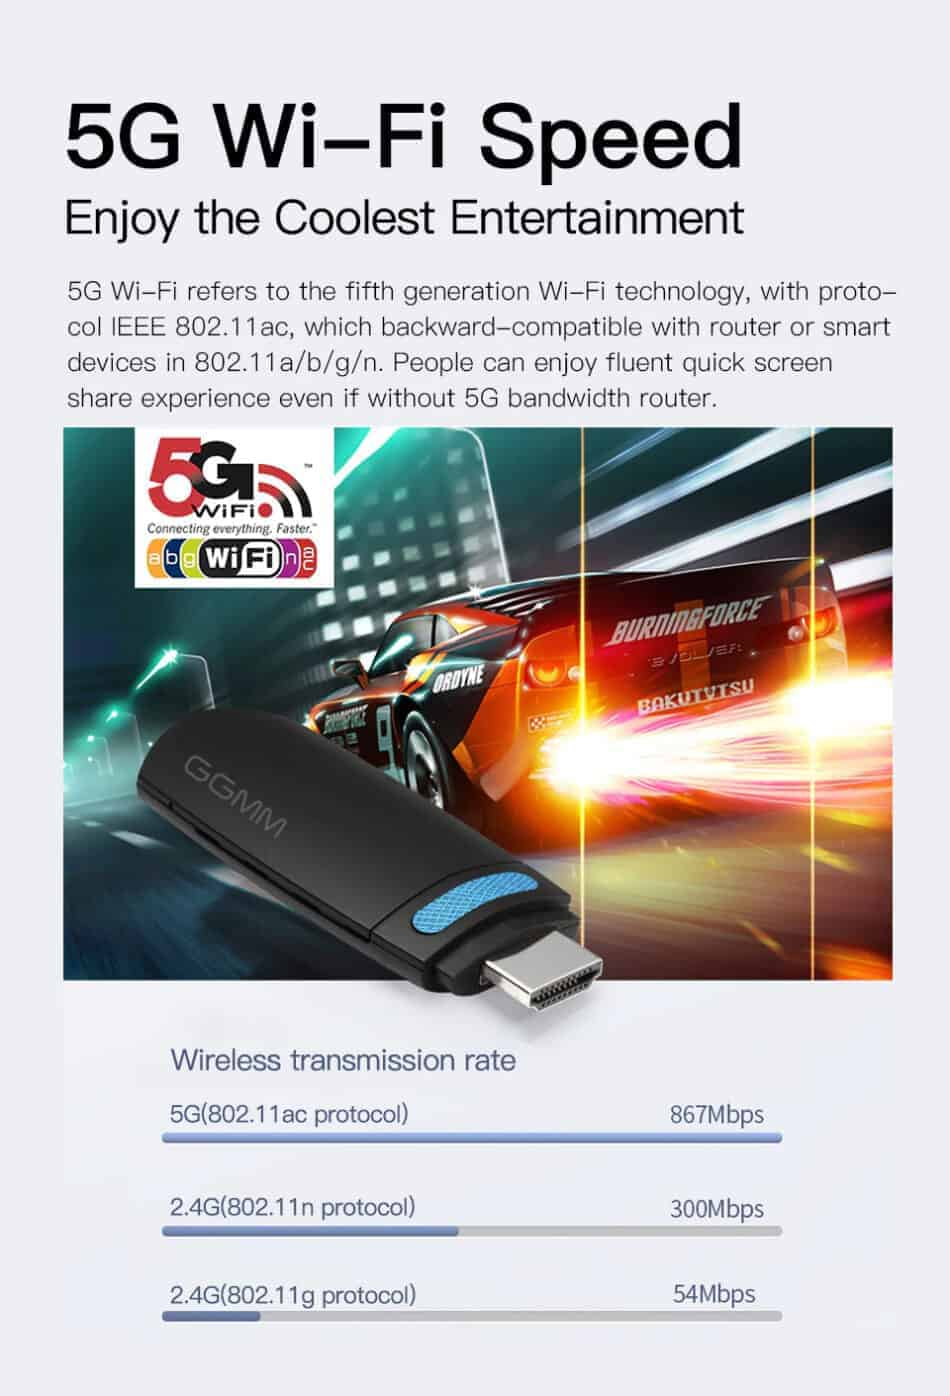 Dongle WiFi Wireless HDMI TO TV WiFi 5G-2.4G for YouTube GGMM 5G Wi-Fi Speed